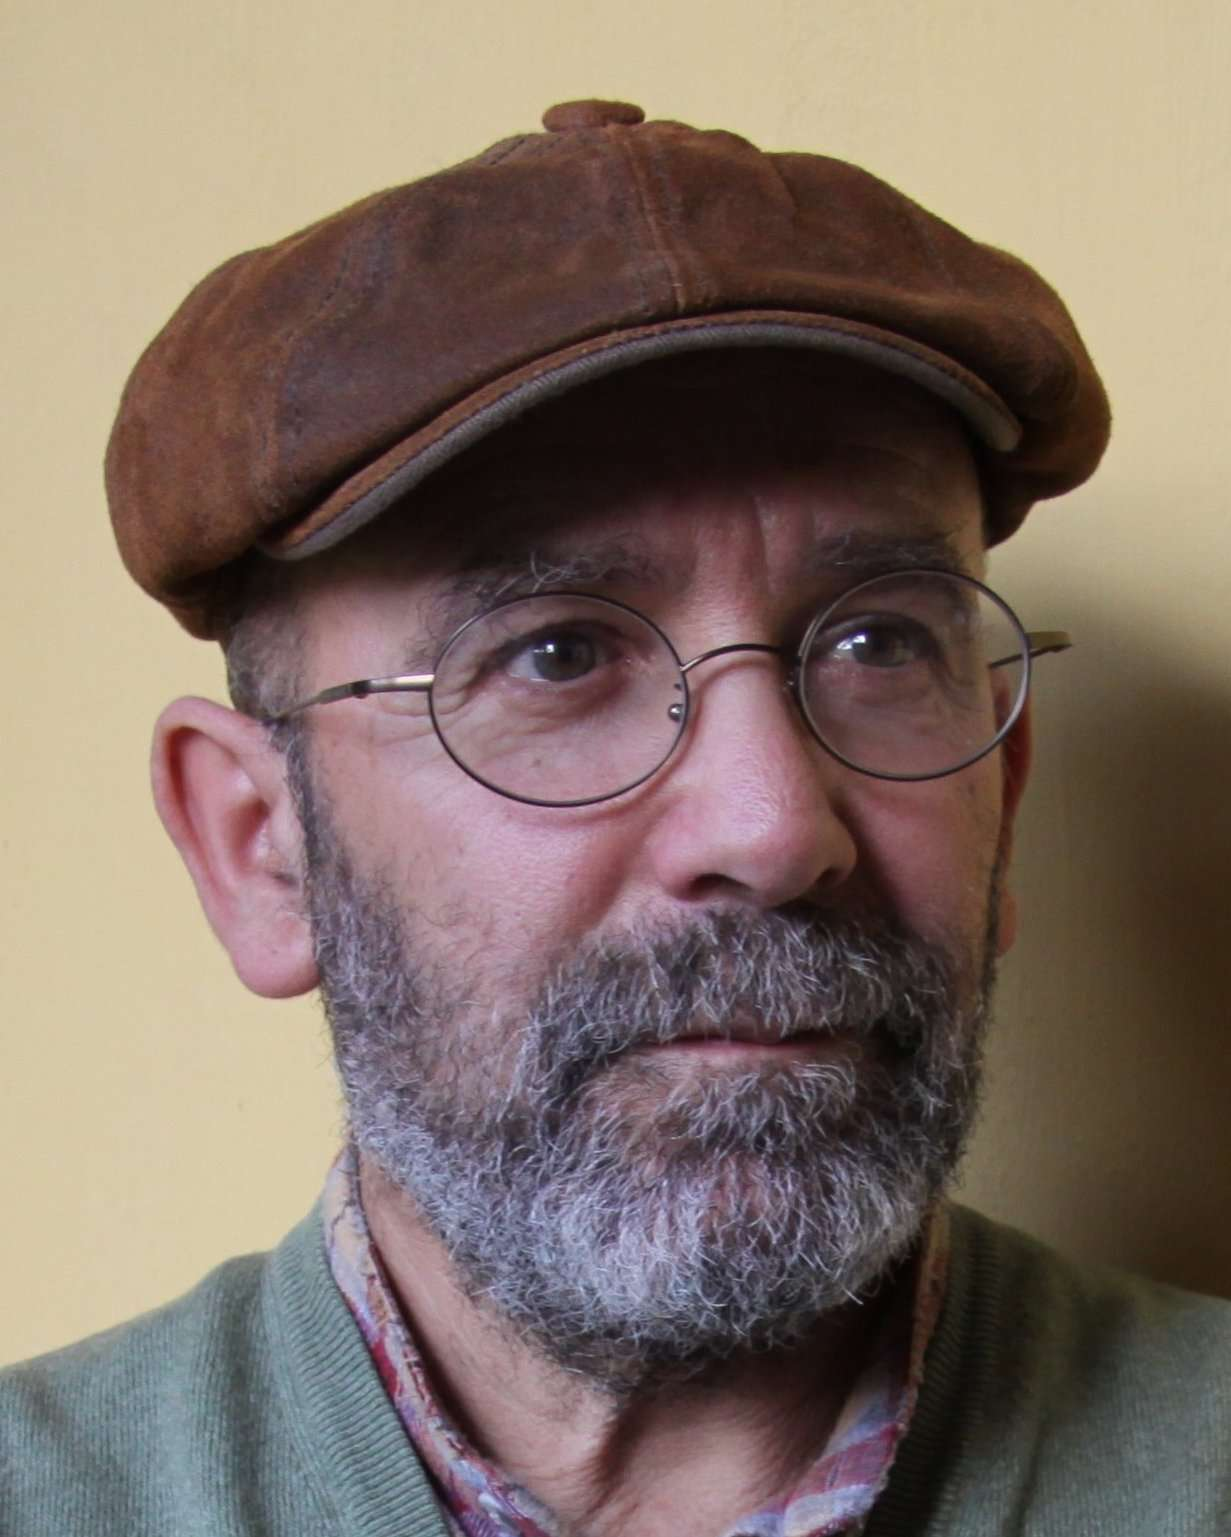 Josep Canals Miquel